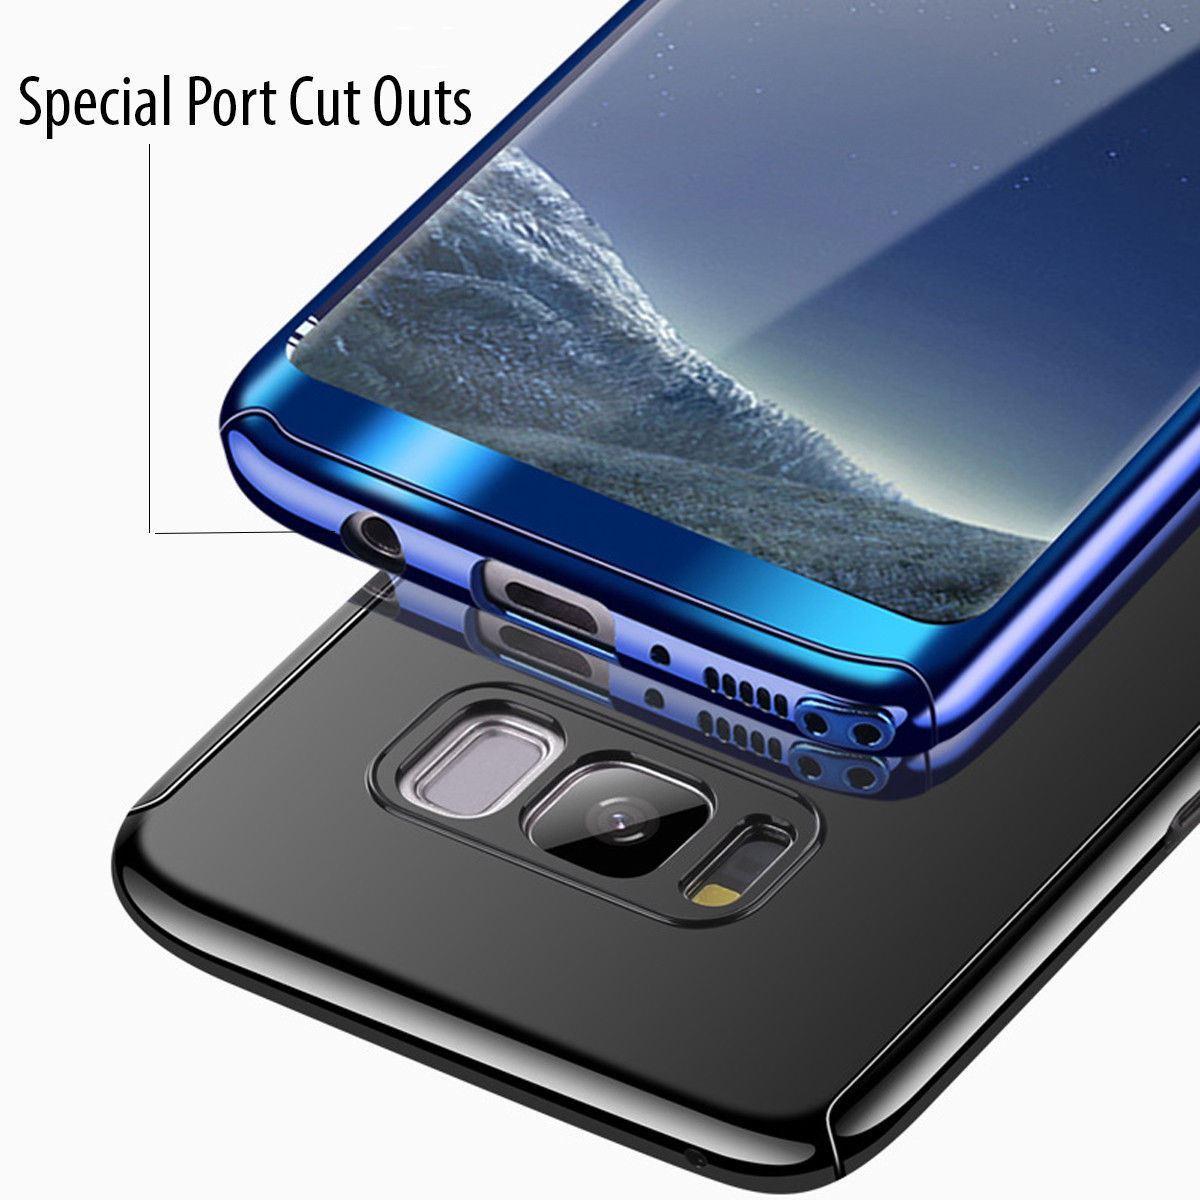 Shockproof-Hybrid-360-Ultra-Thin-Mirror-Hard-Case-Samsung-Galaxy-S7-edge-S8-S9 thumbnail 67